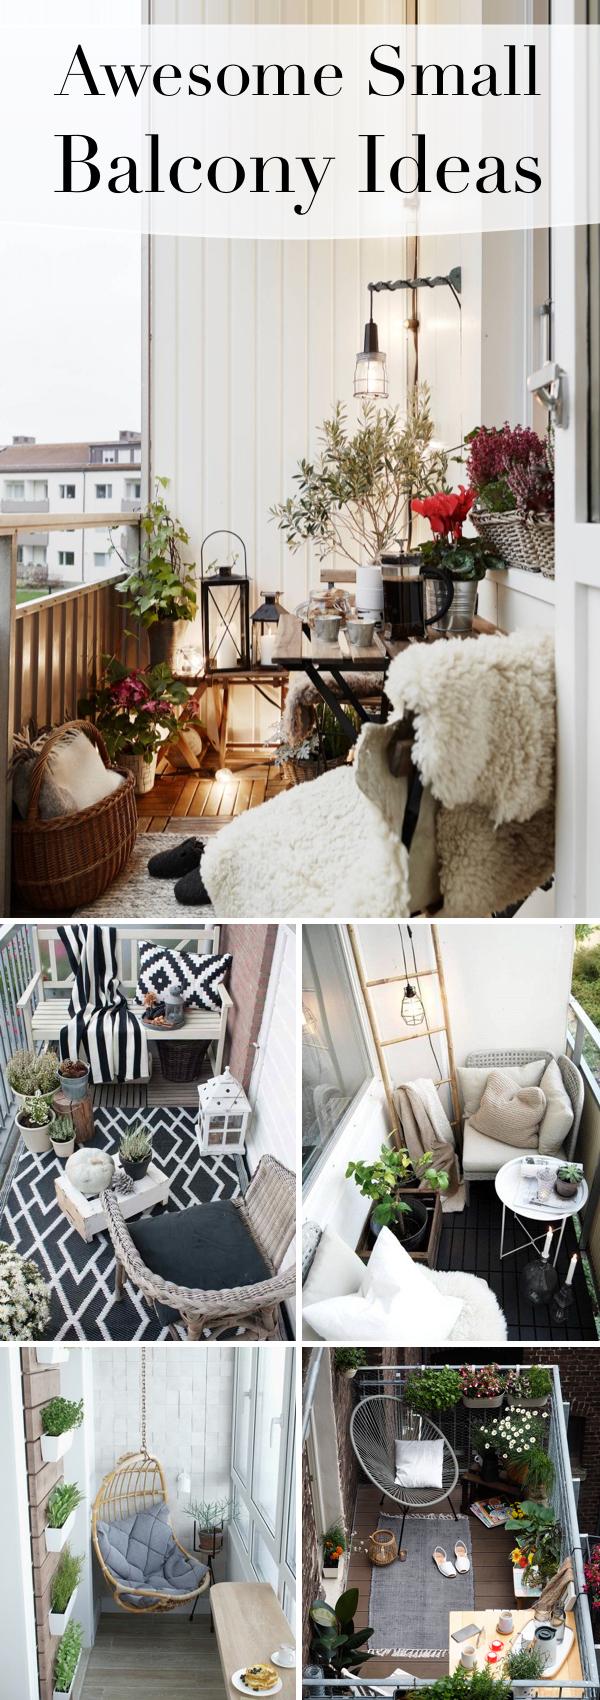 20 Awesome Small Balcony Ideas